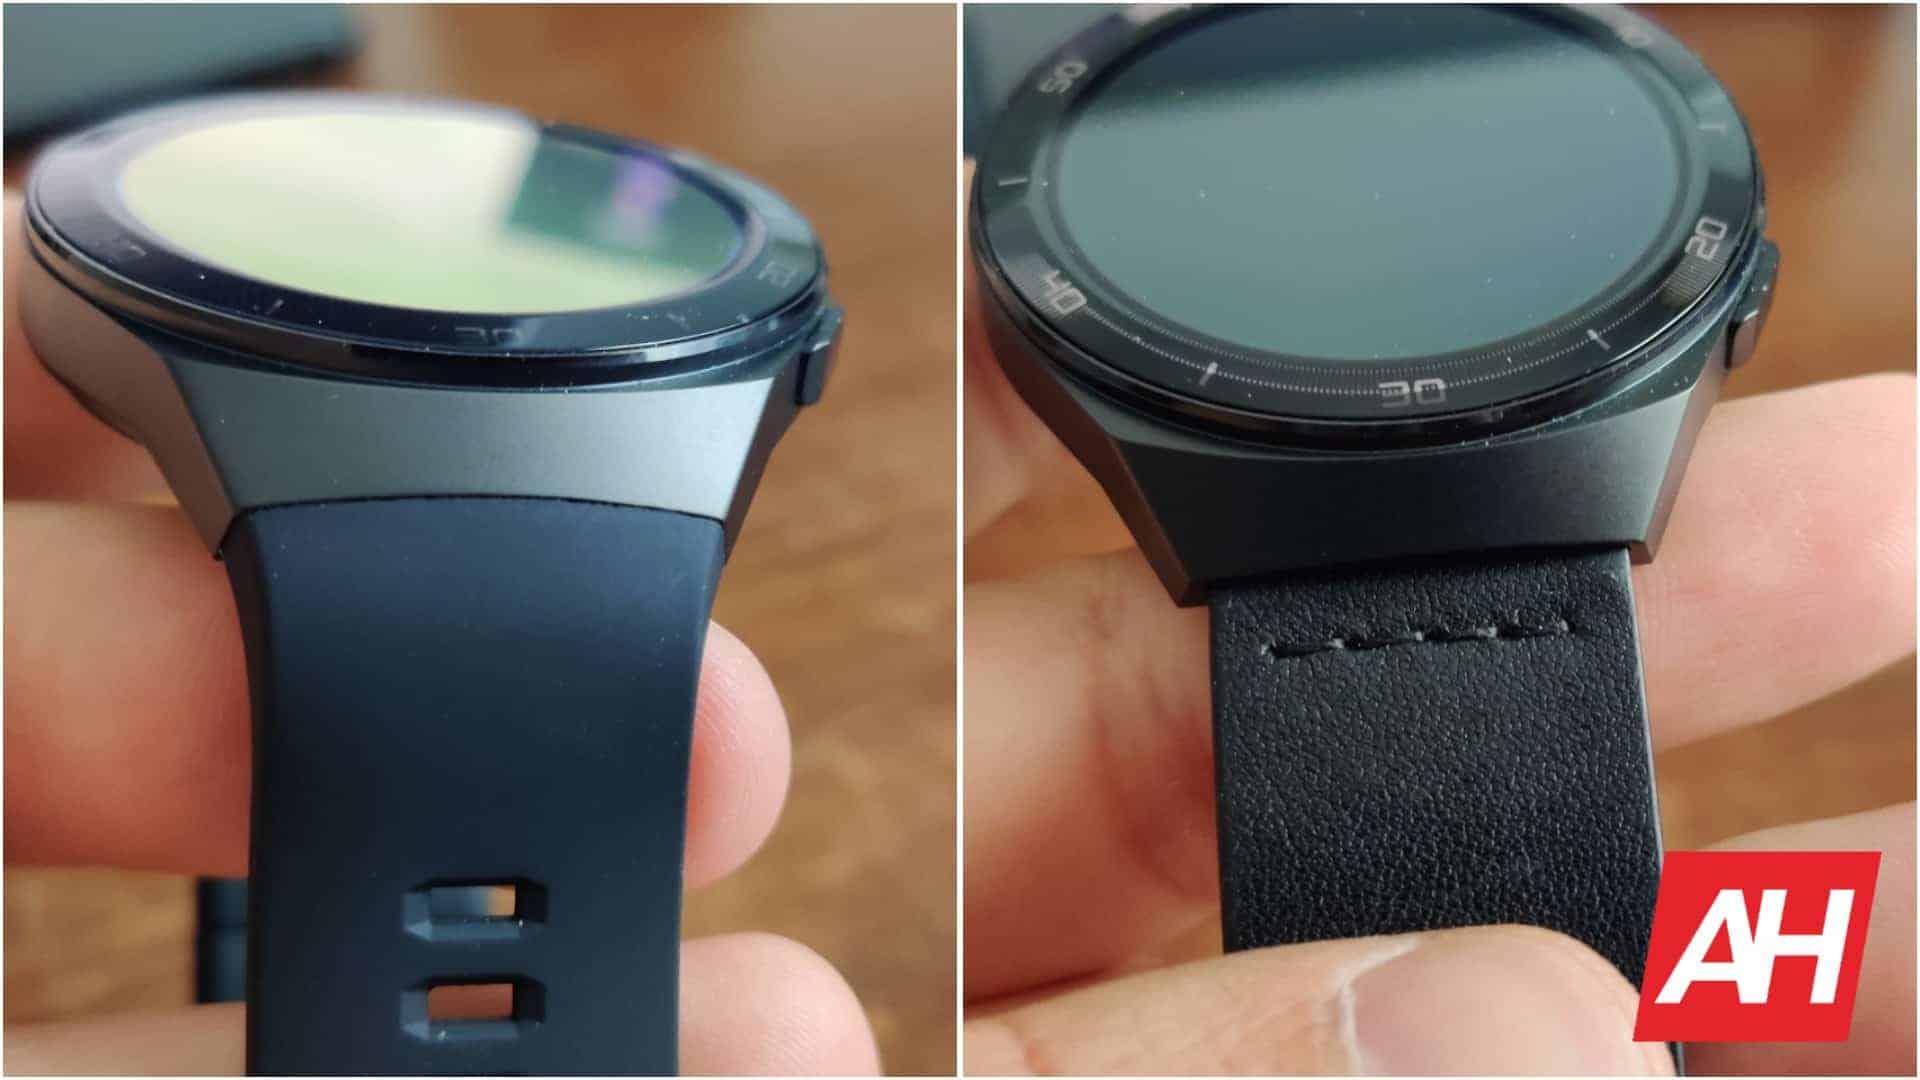 AH Huawei GT 2e original vs third party strap